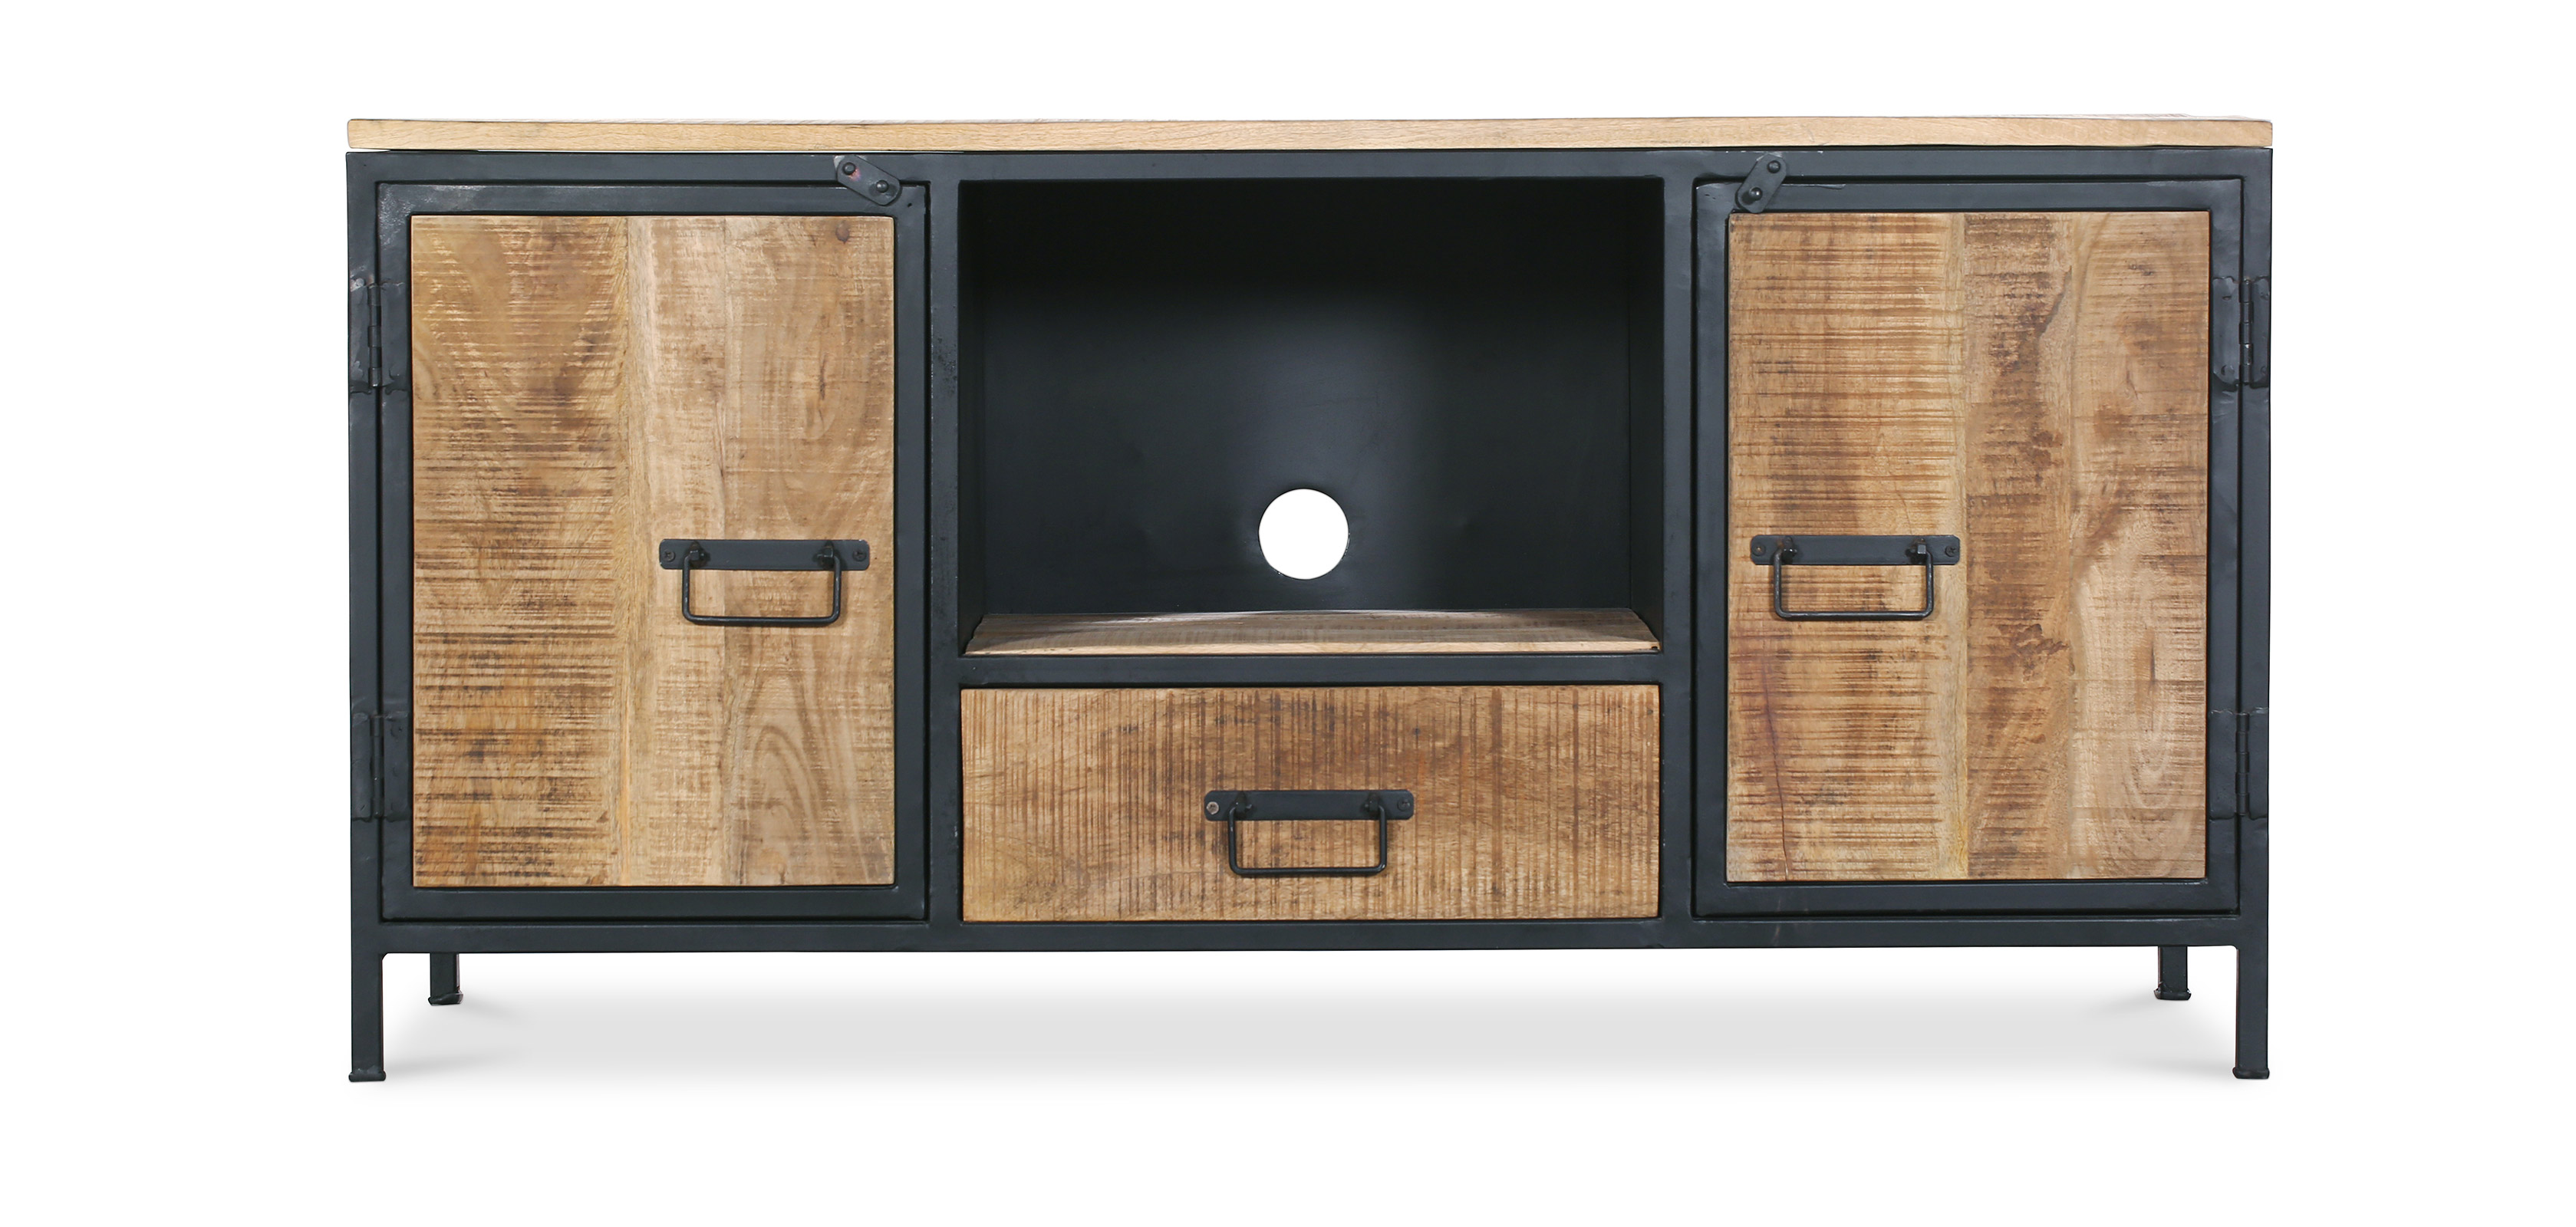 Onawa Vintage Industrial Style Metal Tv Cabinet